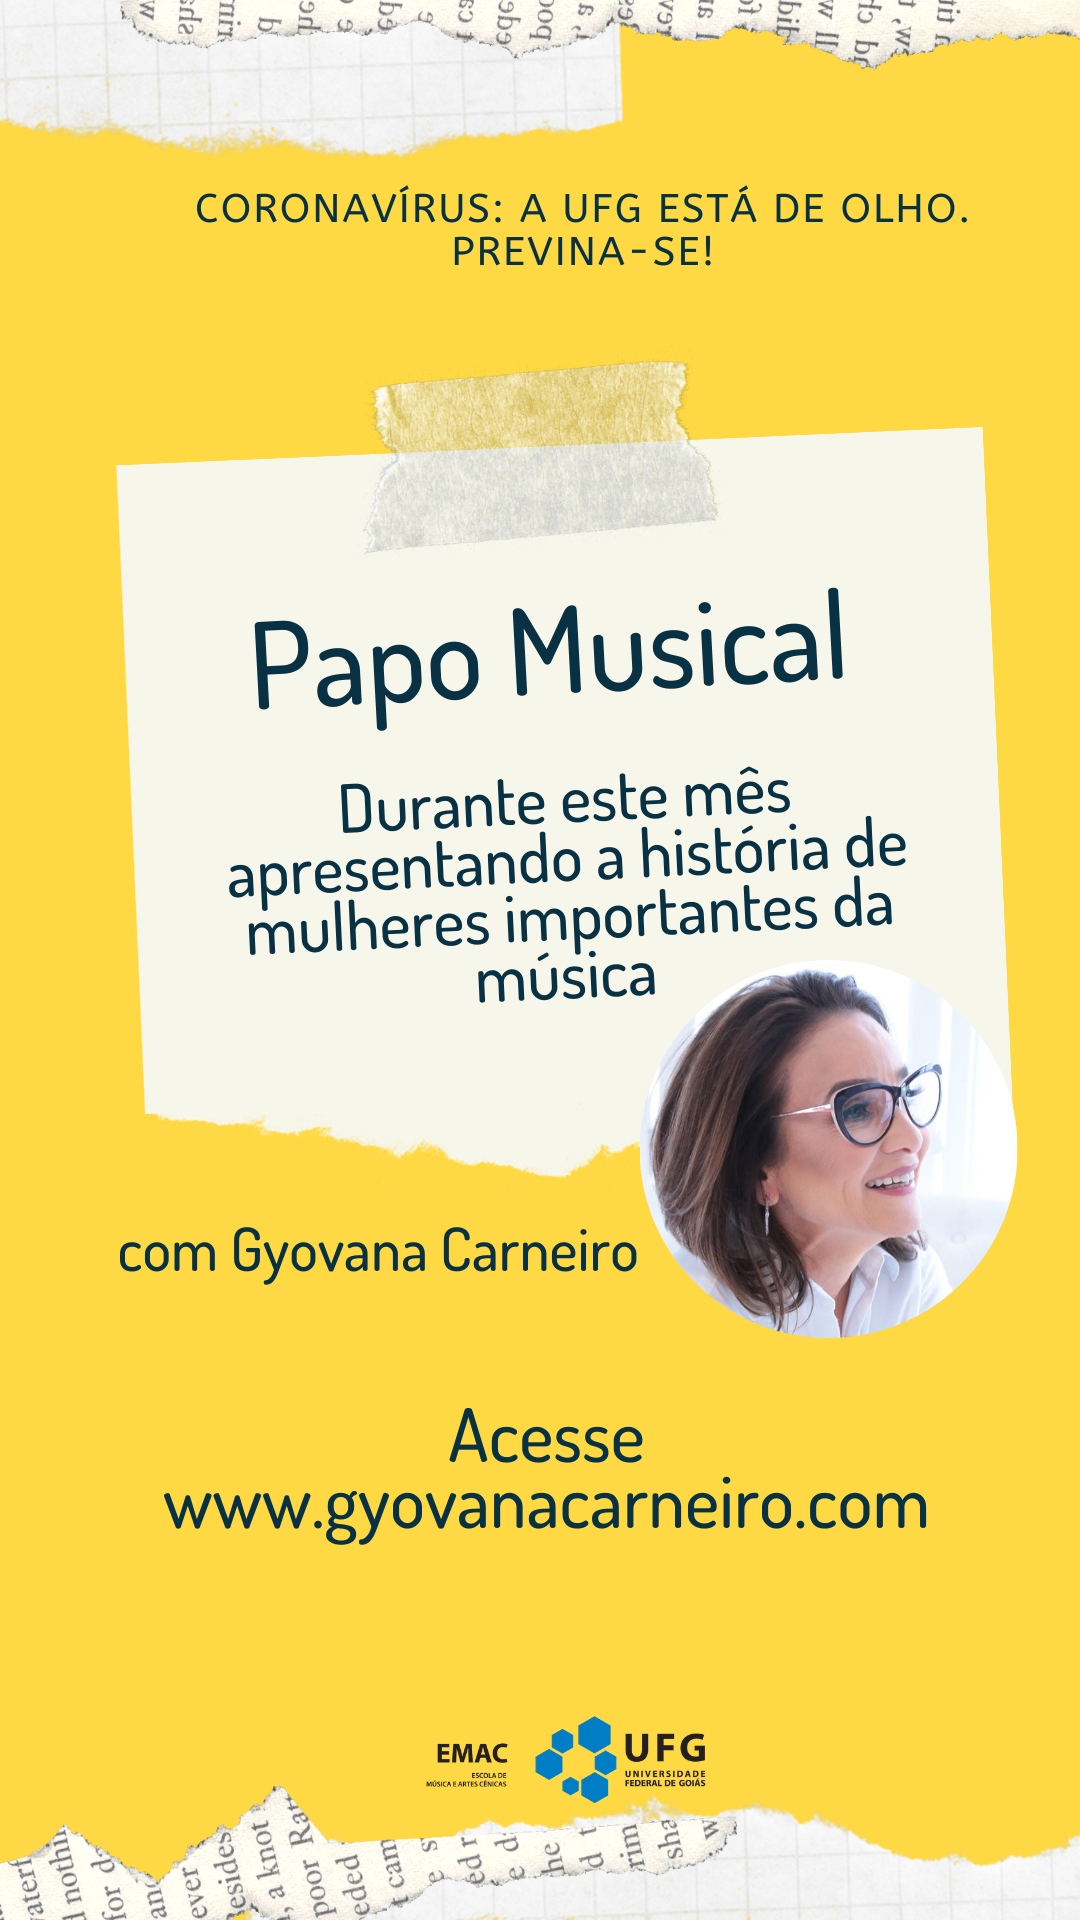 Gyovana papo musical